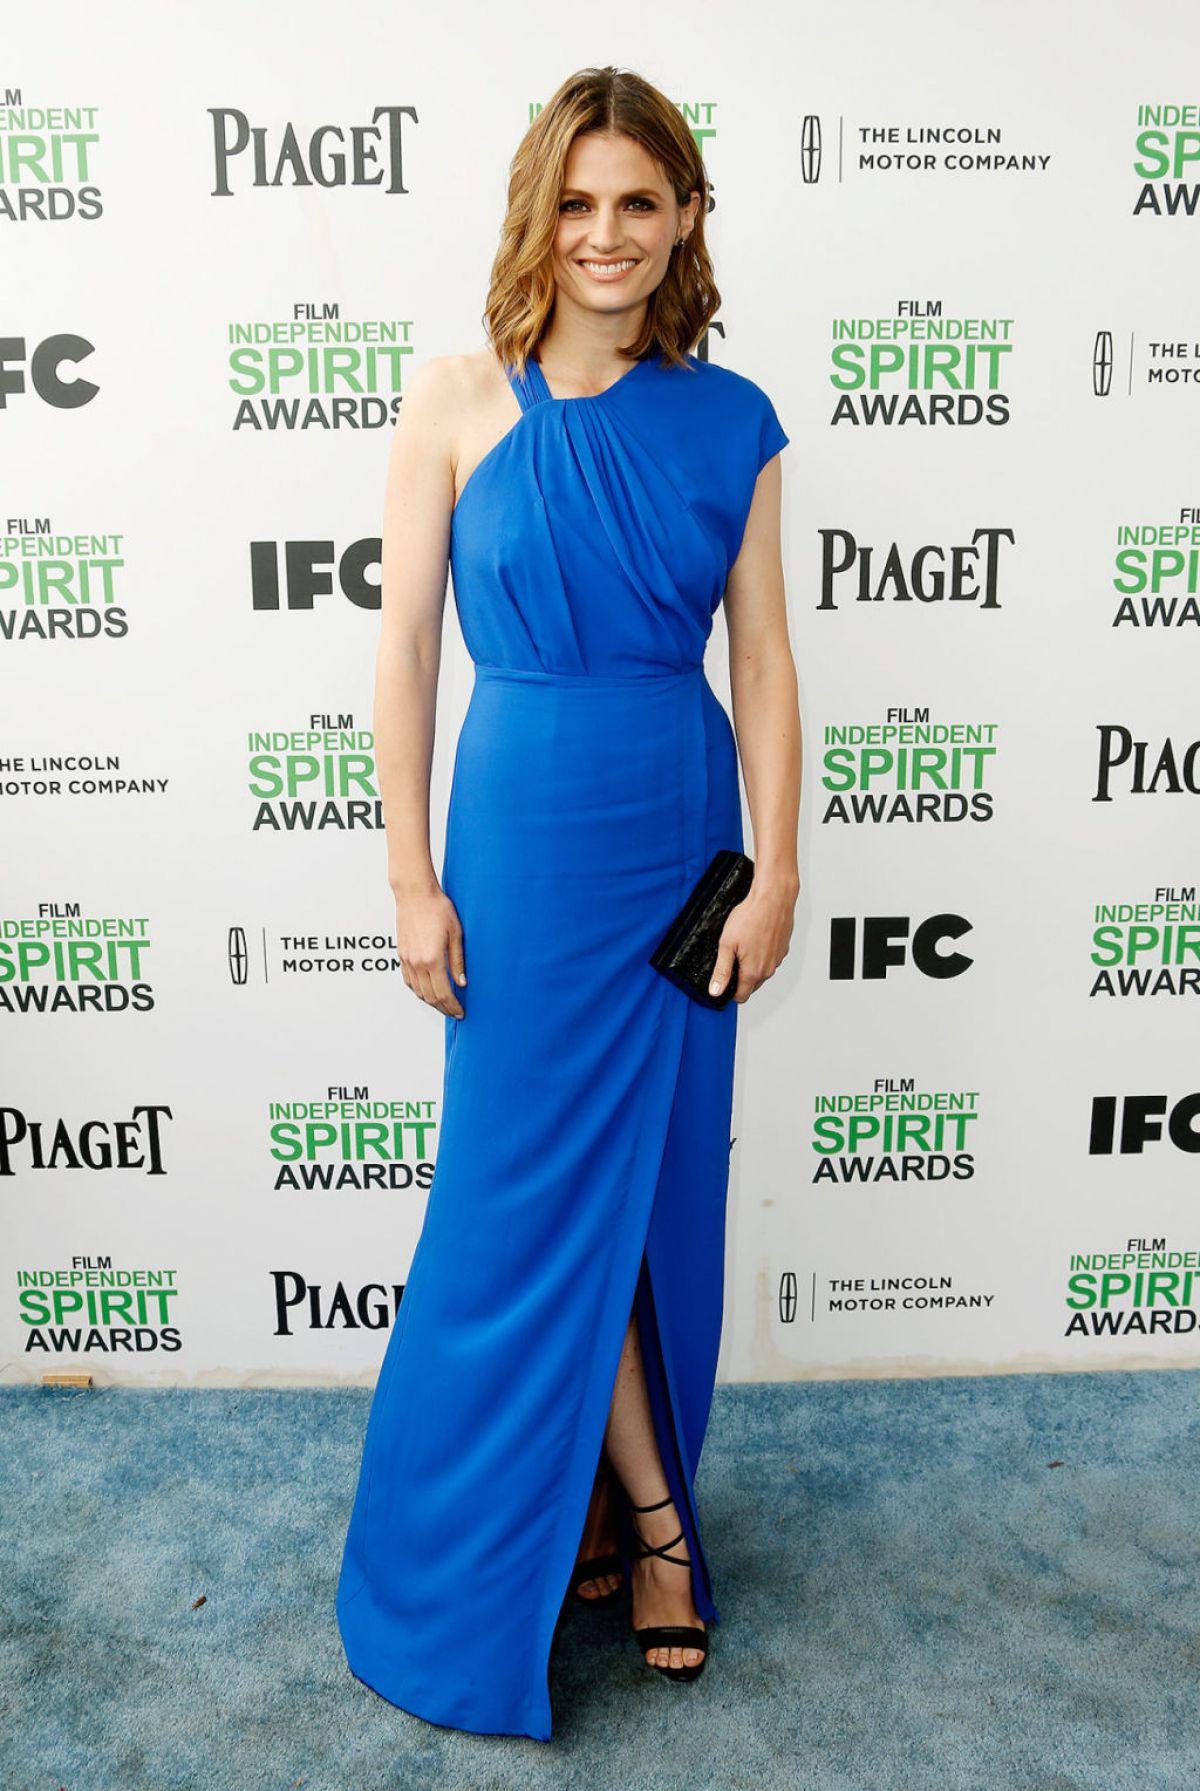 STANA KATIC at 2014 Film Independent Spirit Awards in Santa Monica